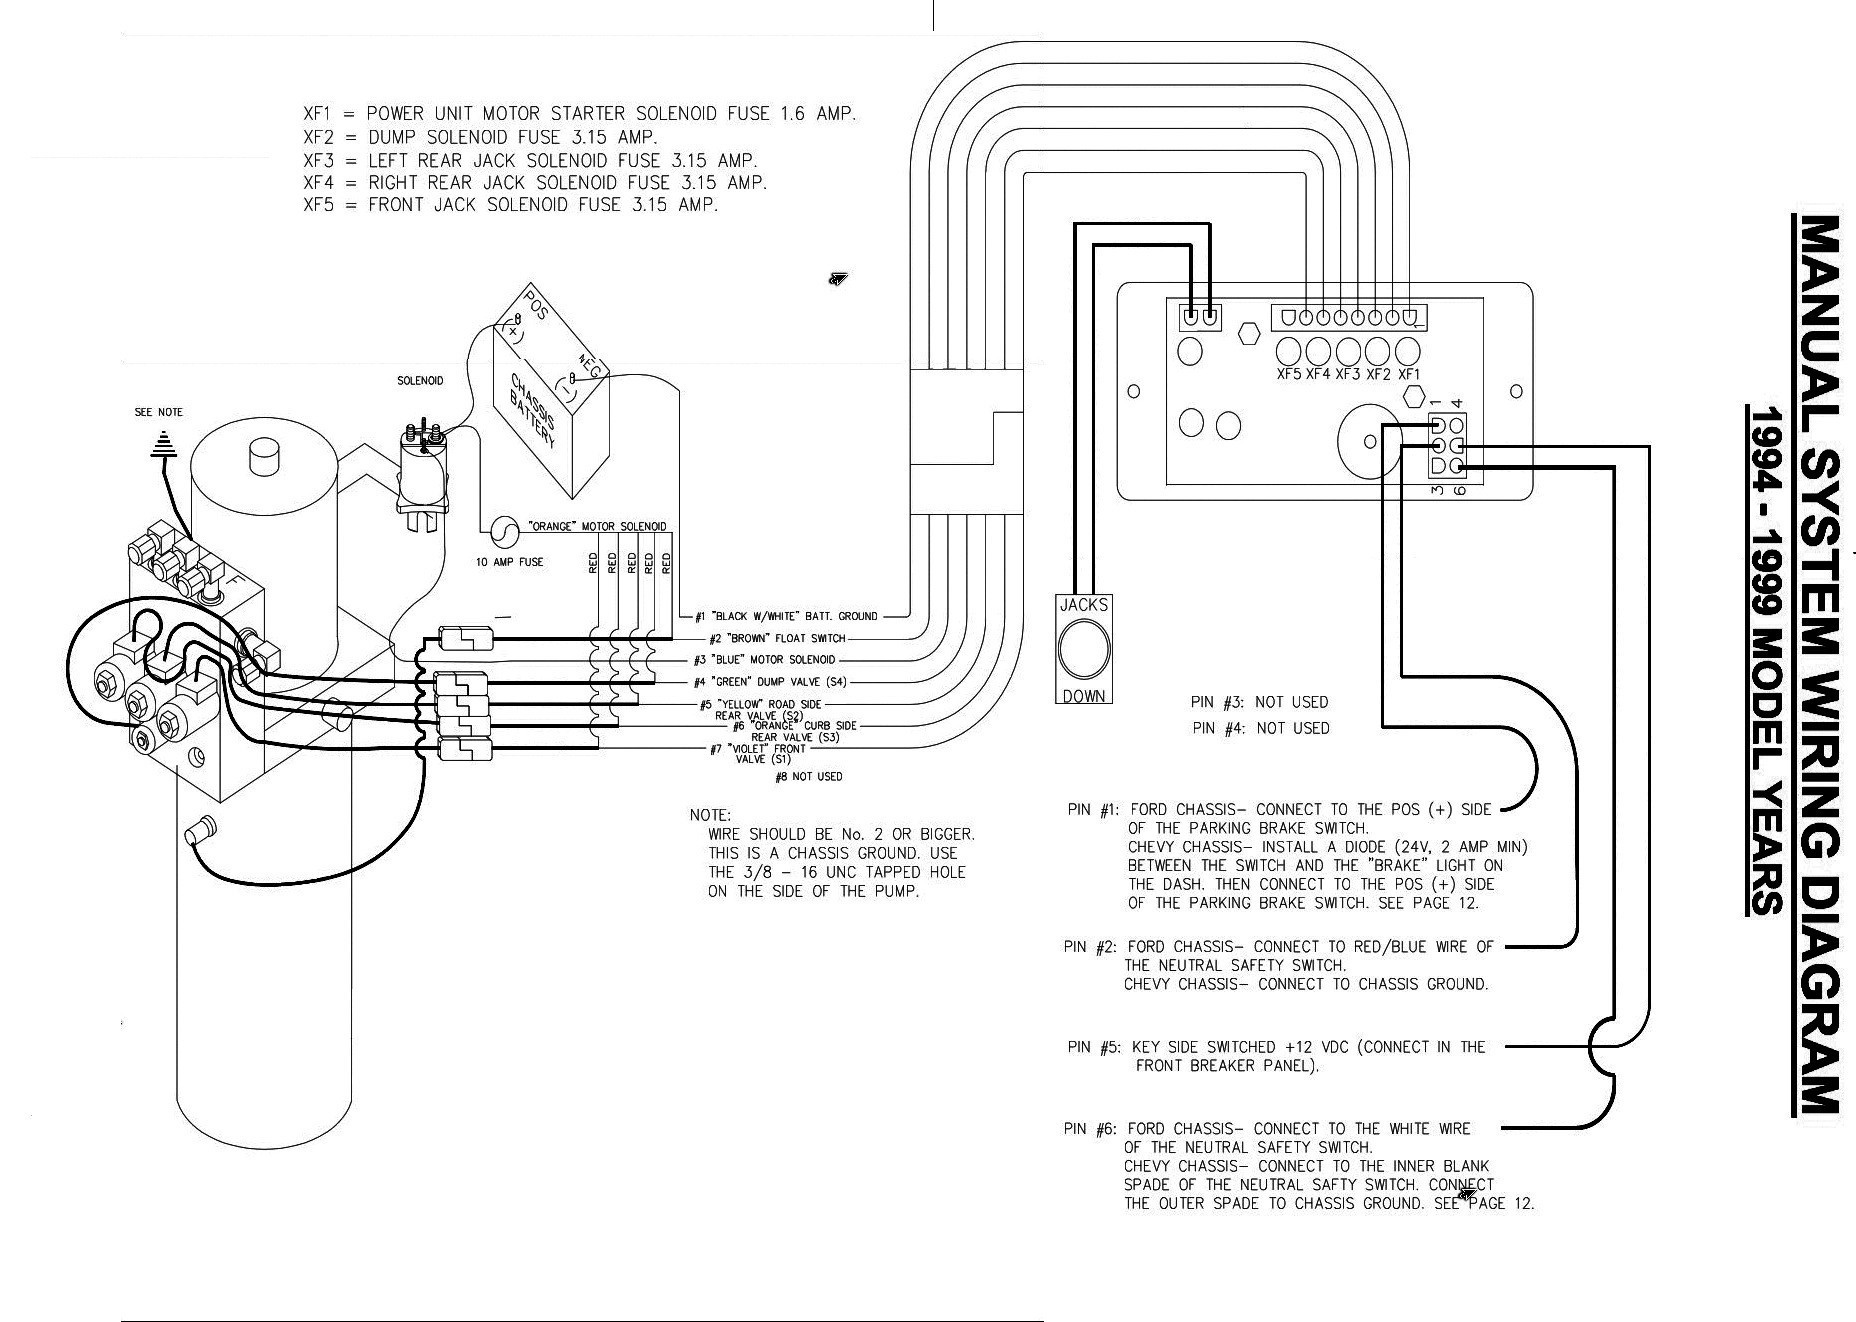 coachmen wiring diagram newmar wiring diagrams com coachmen rv Typical RV Wiring Diagram